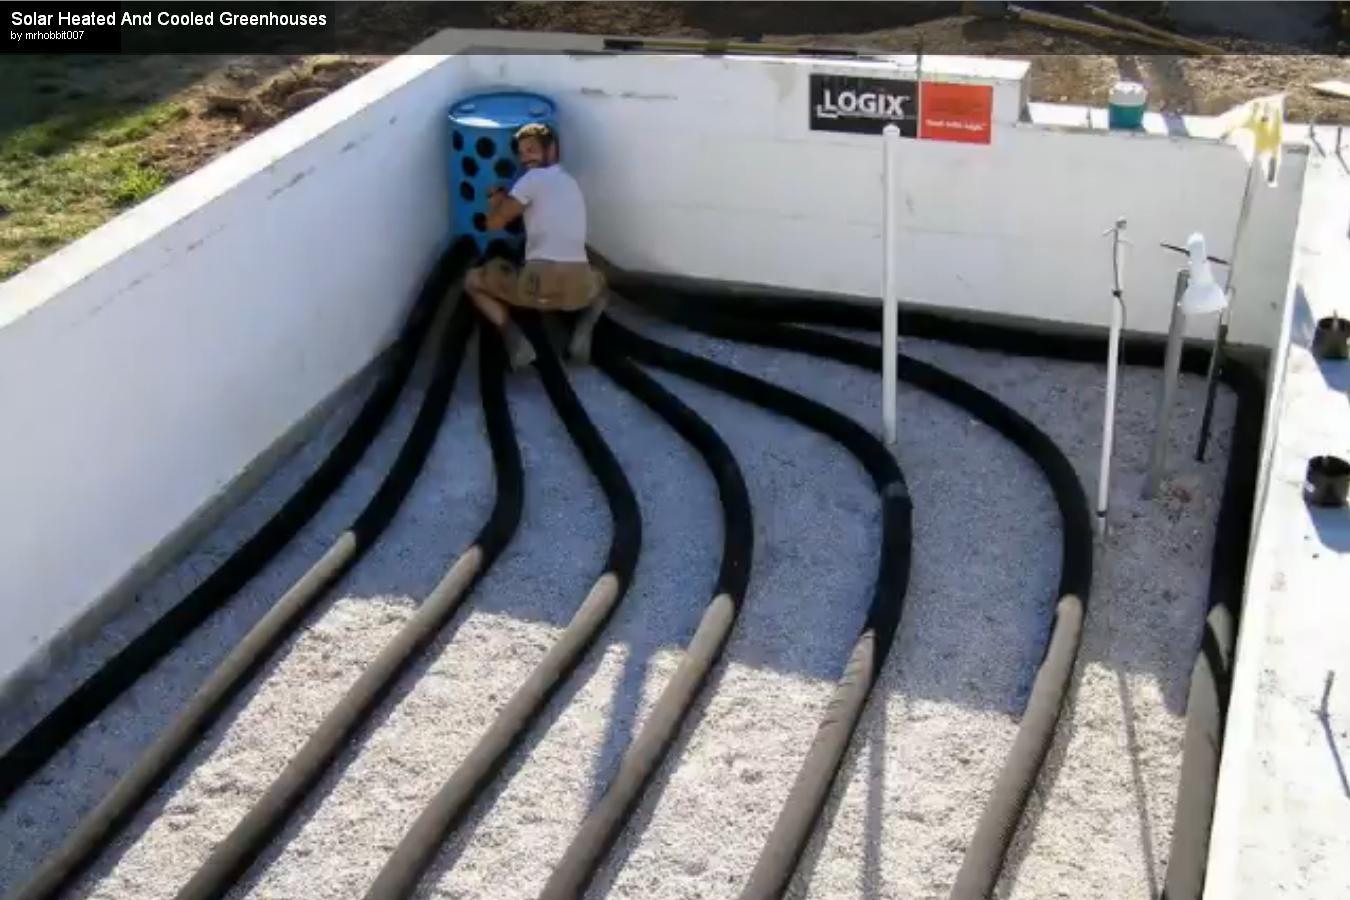 3x5 Aquaponics Subterranean Heating And Cooling